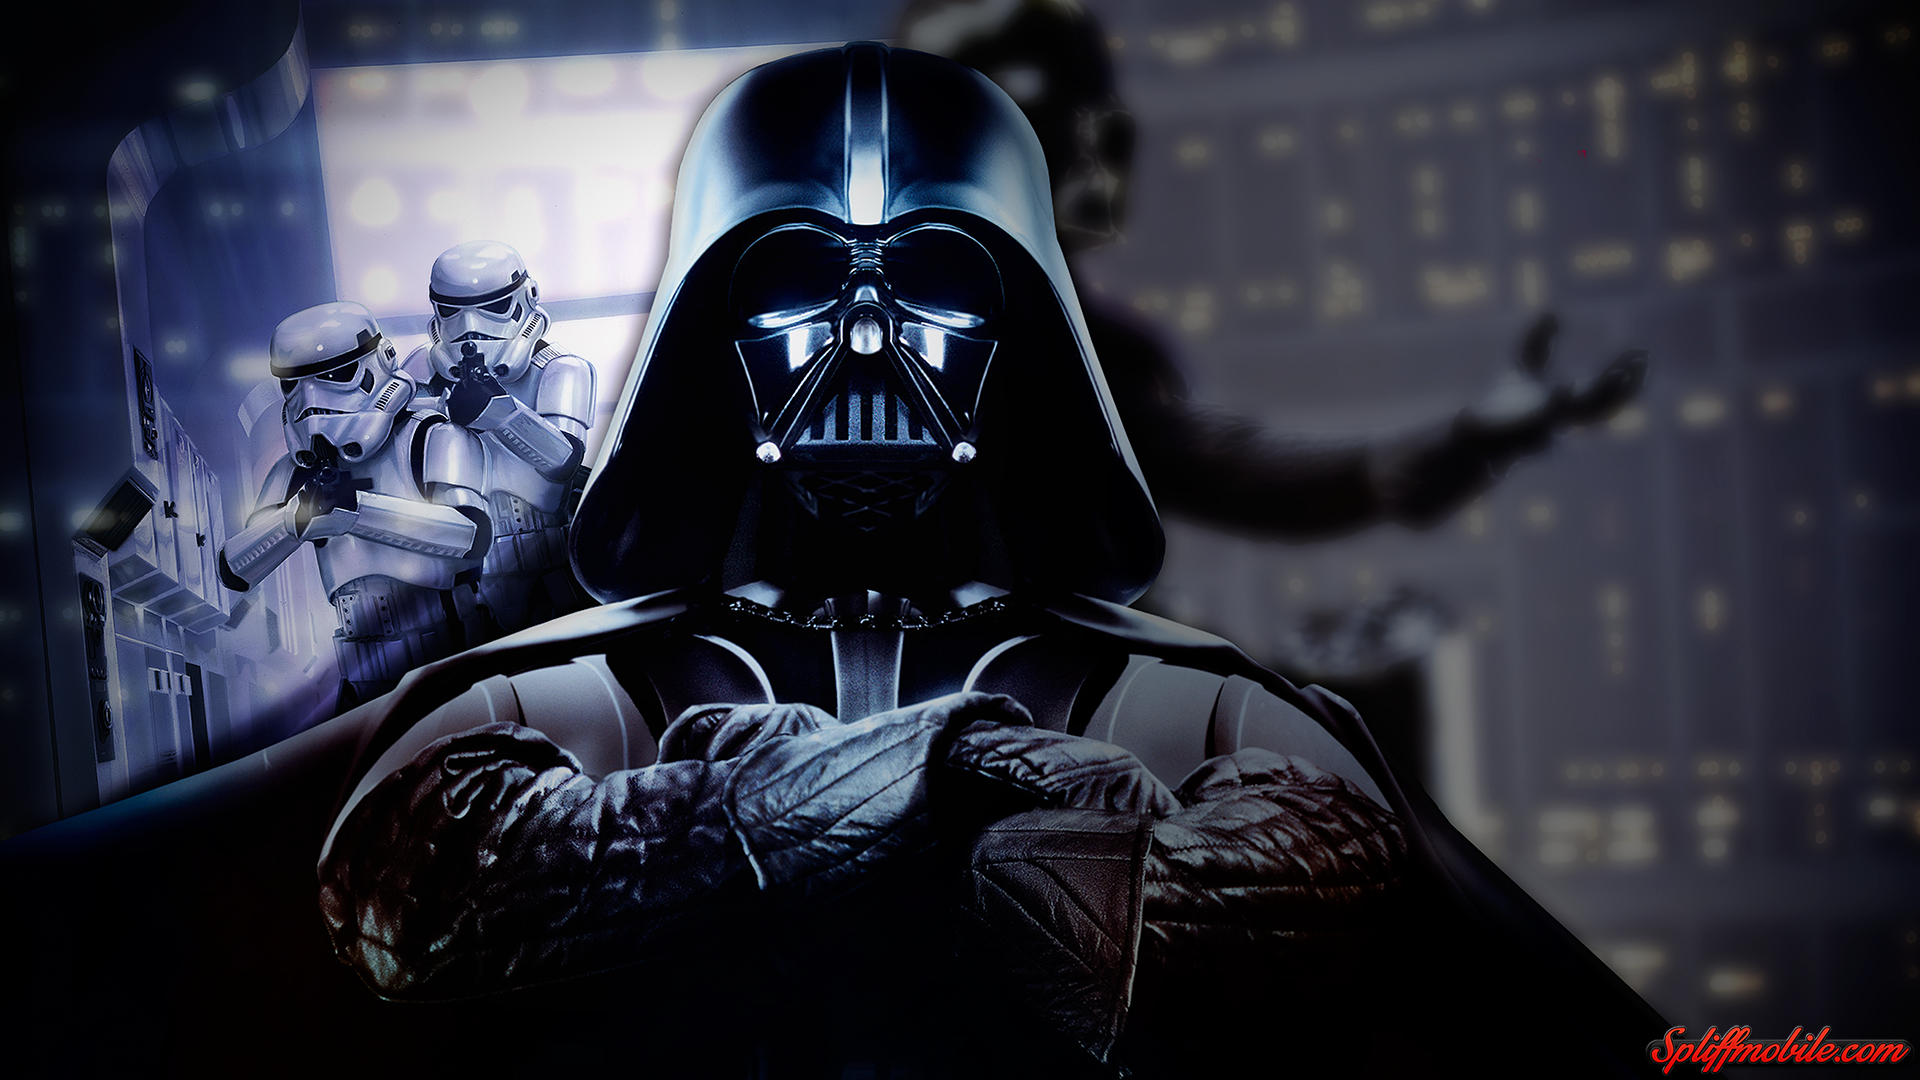 Pics Photos   Darth Vader Wallpaper Image Gallery 1920x1080